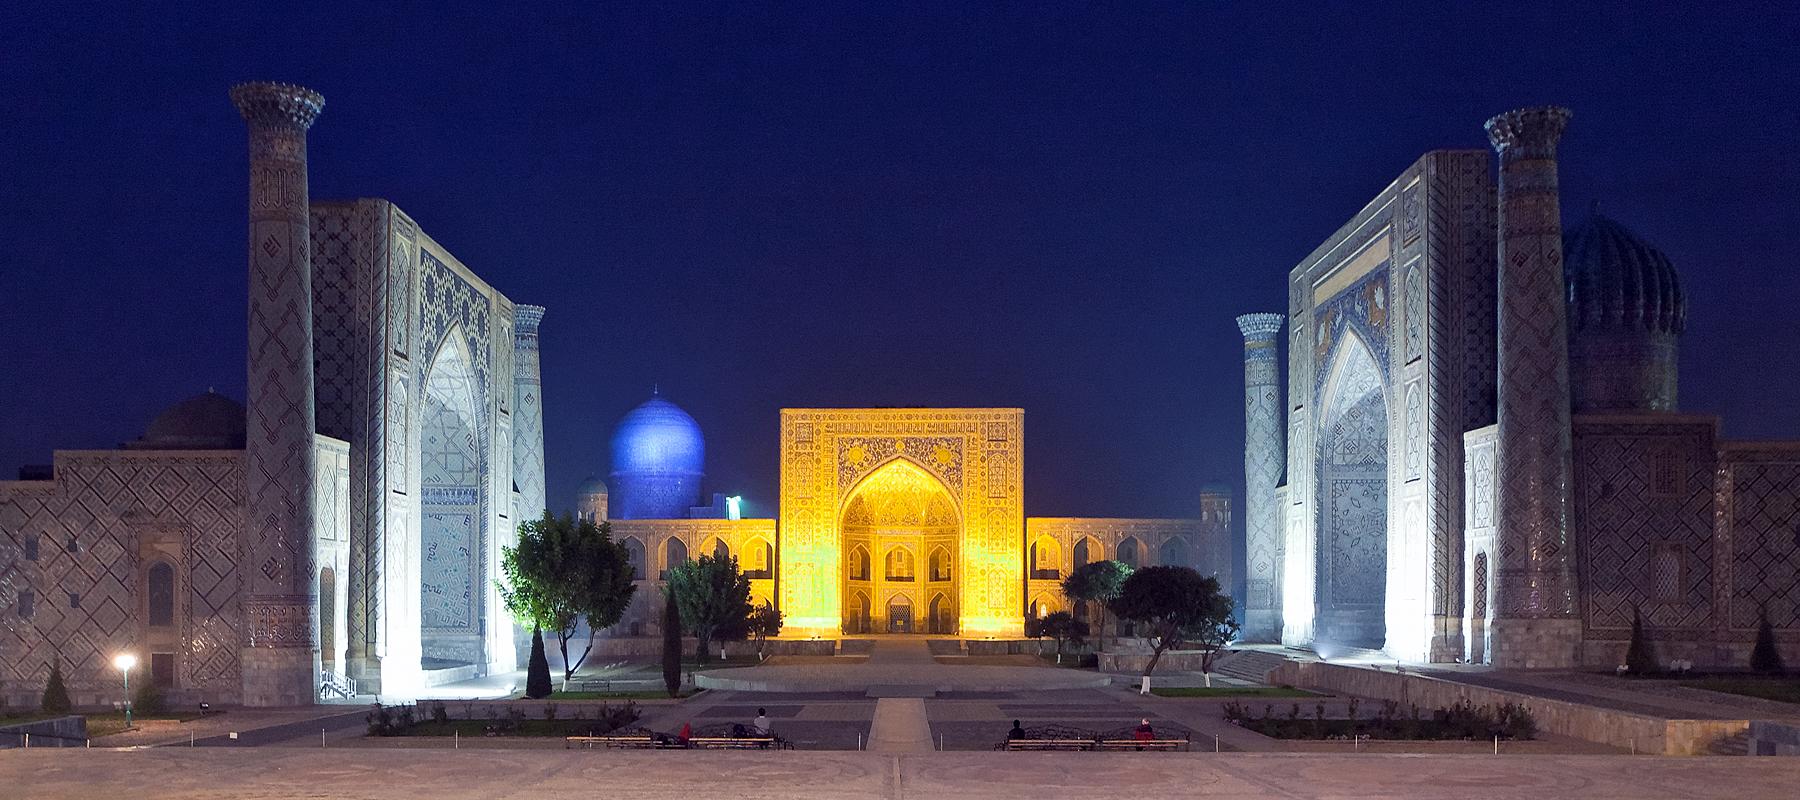 Registan in Samarkand by night